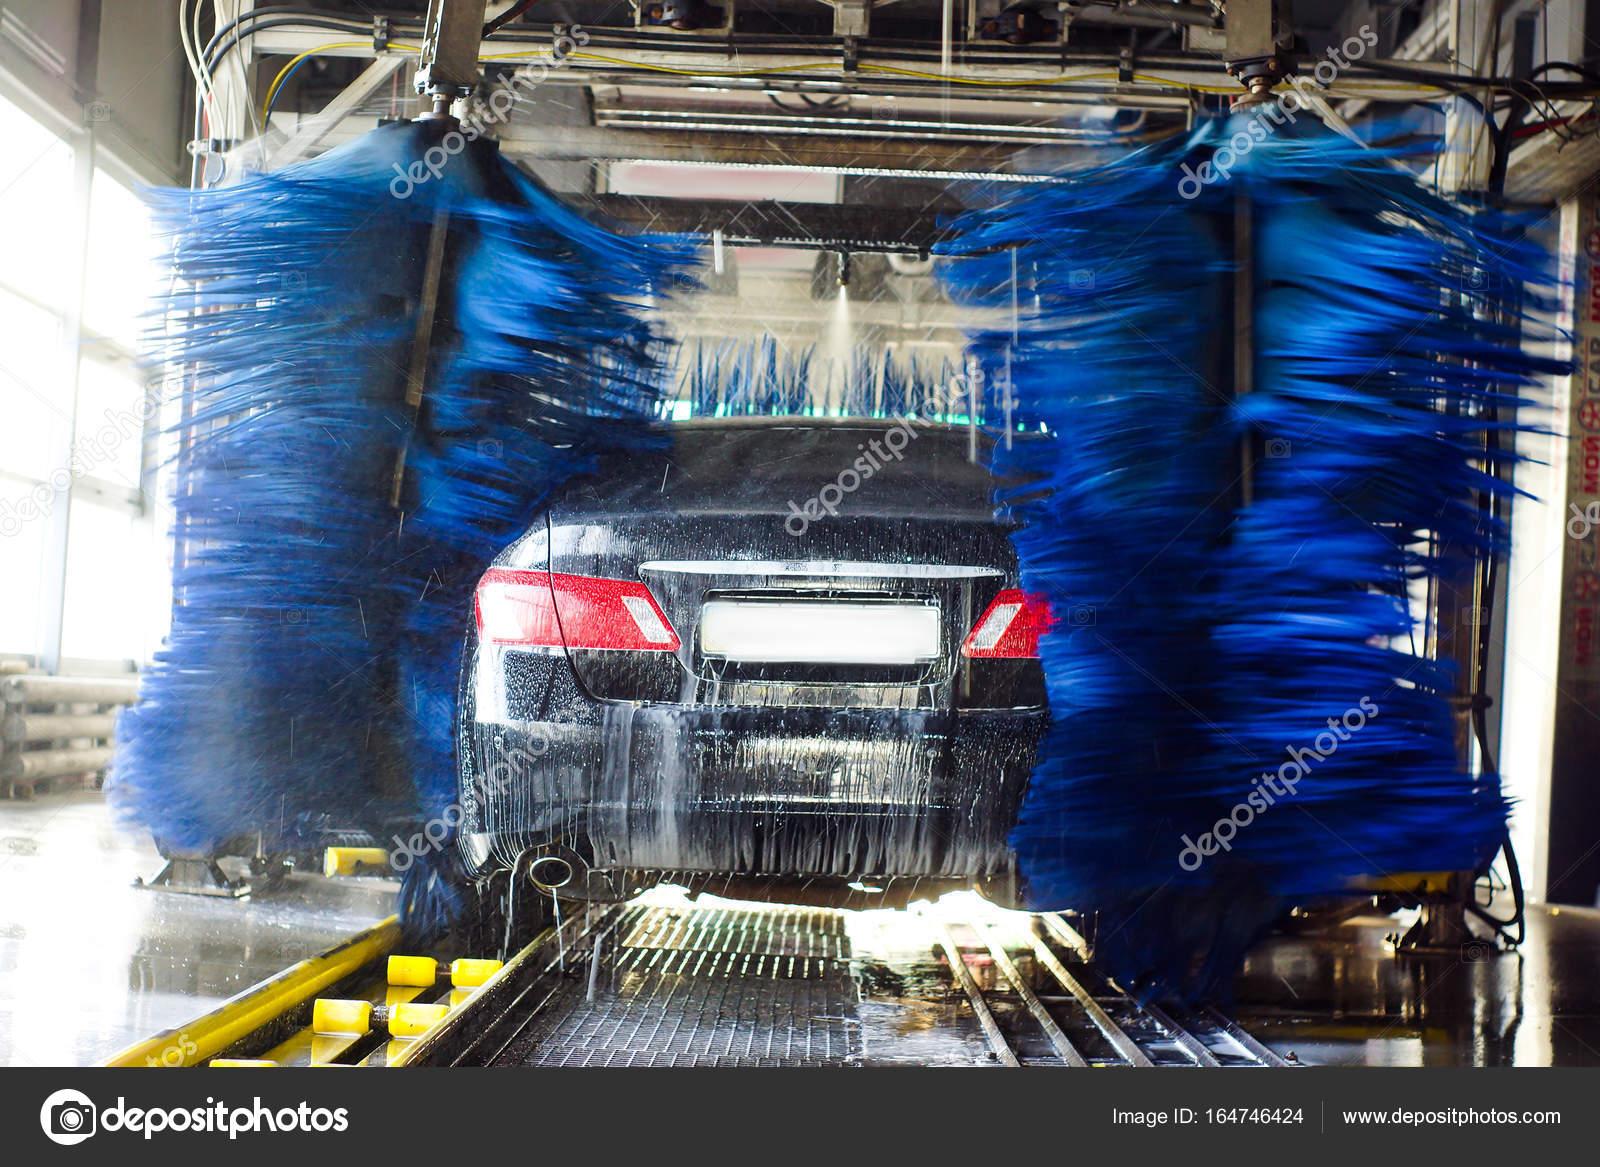 Car Wash Black Car In Automatic Car Wash Rotating Red And Blue Brush Washing Vehicle Stock Photo C Beaver1488 164746424